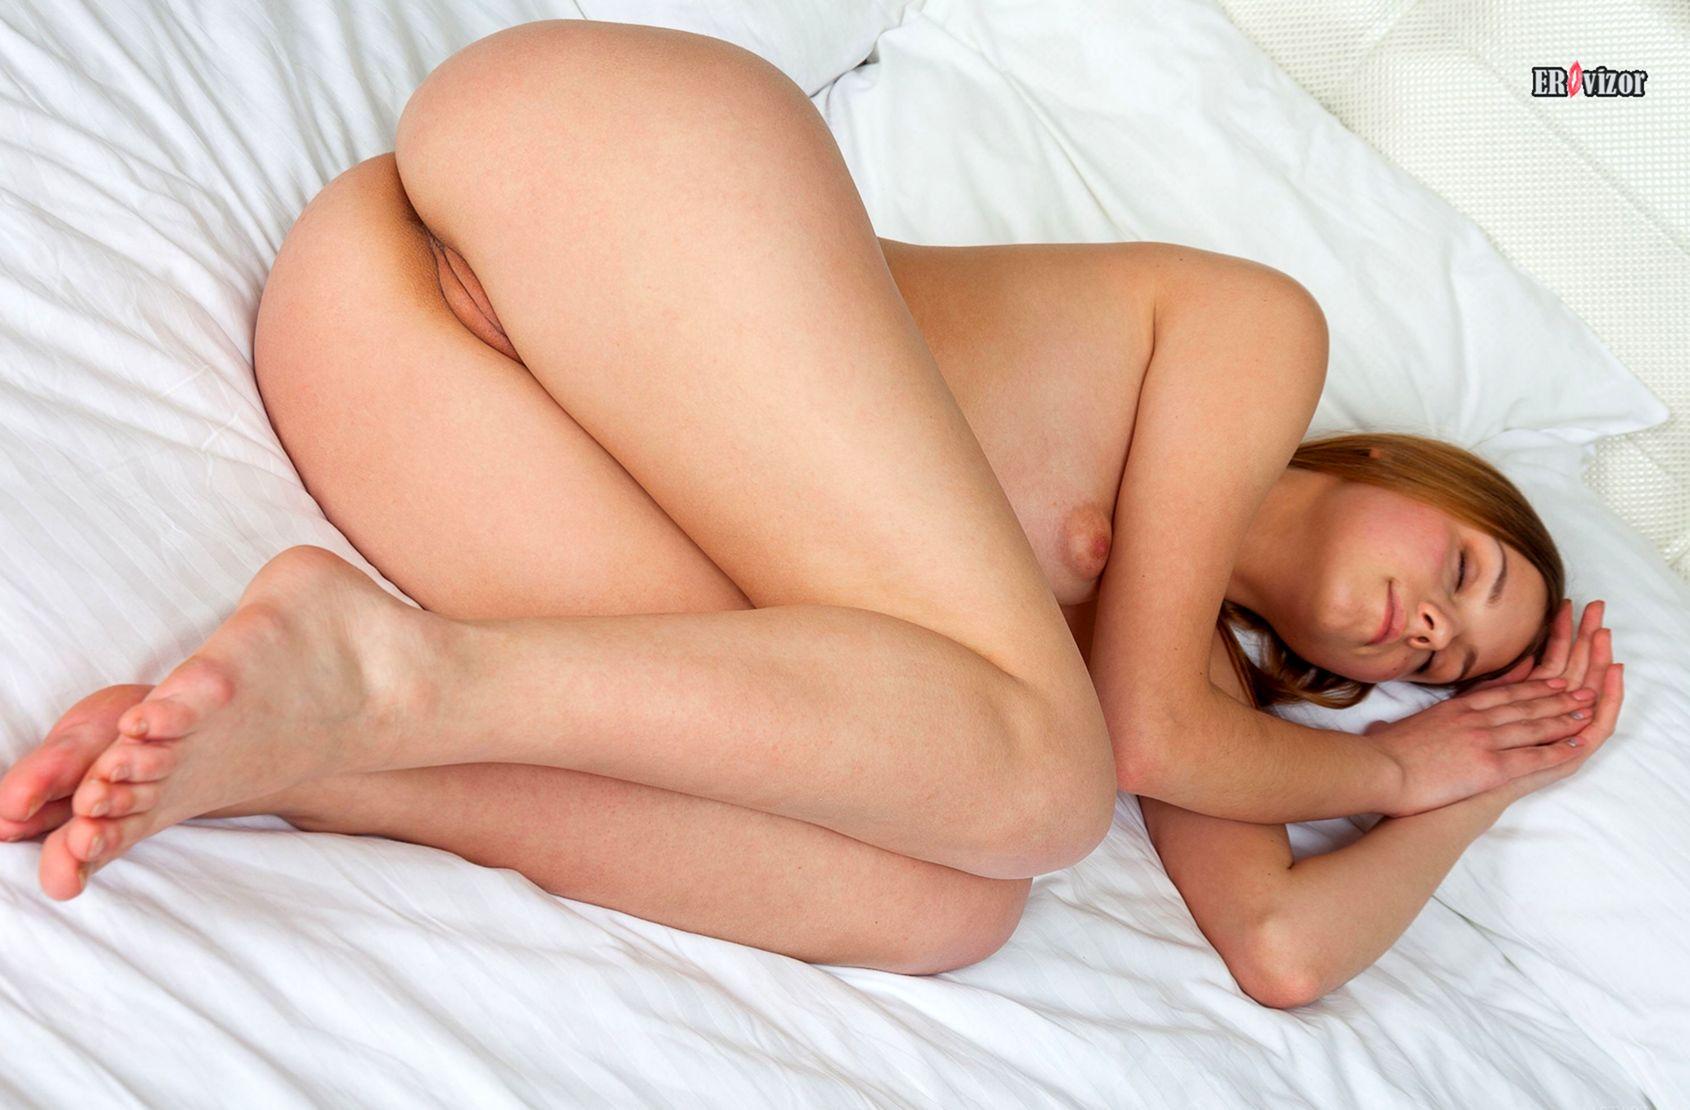 sensual_pose_beauty_women (15)